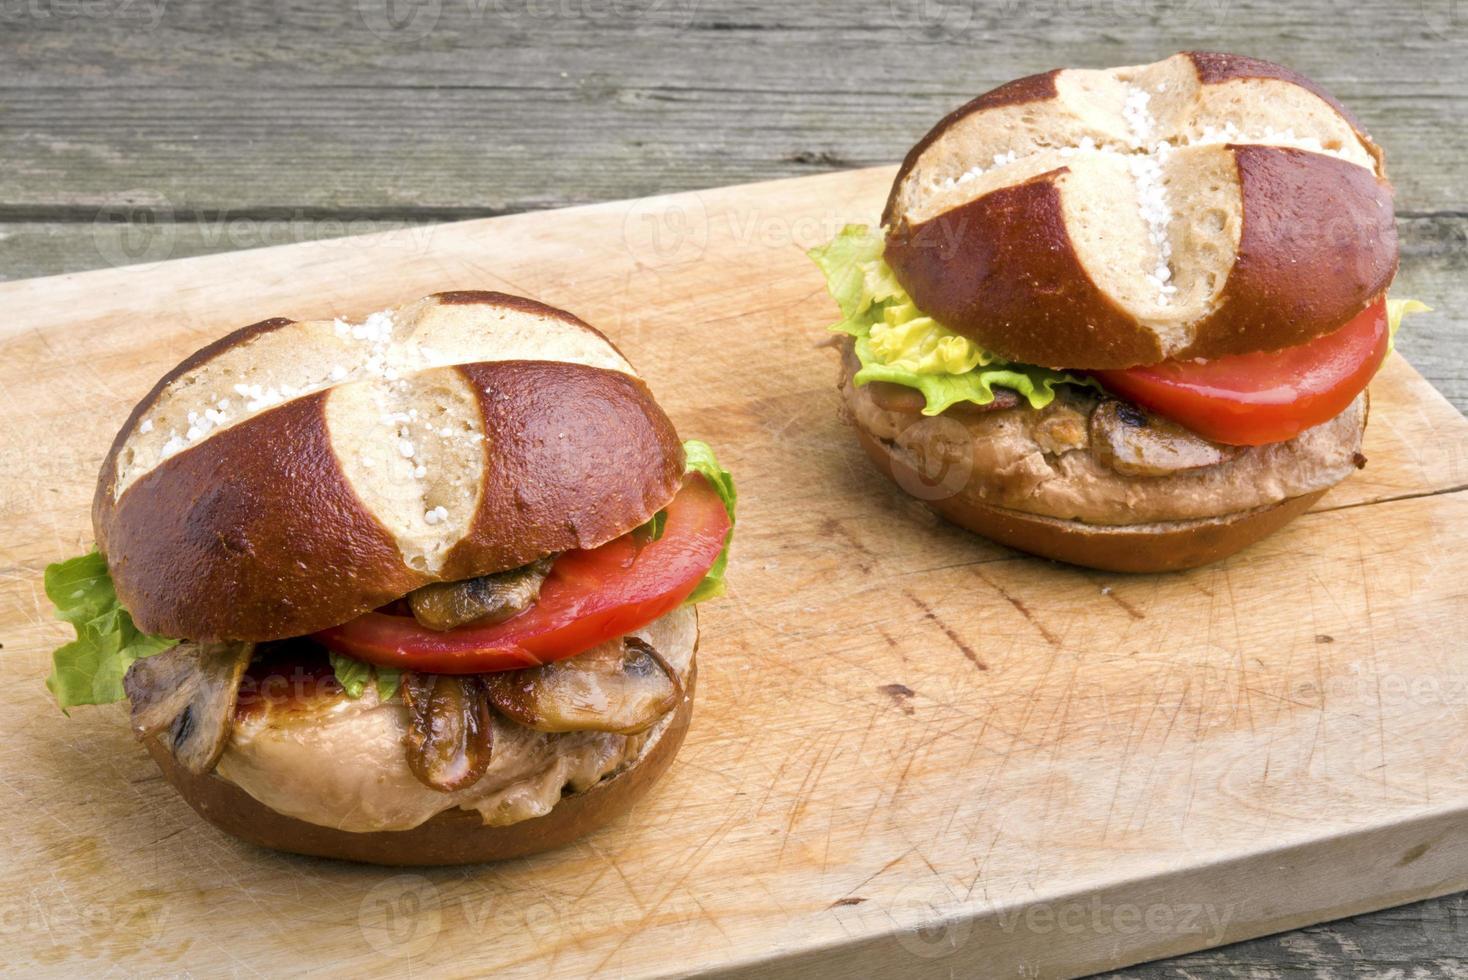 sándwich de filete de cerdo a la parrilla (hamburguesa) con champiñones foto